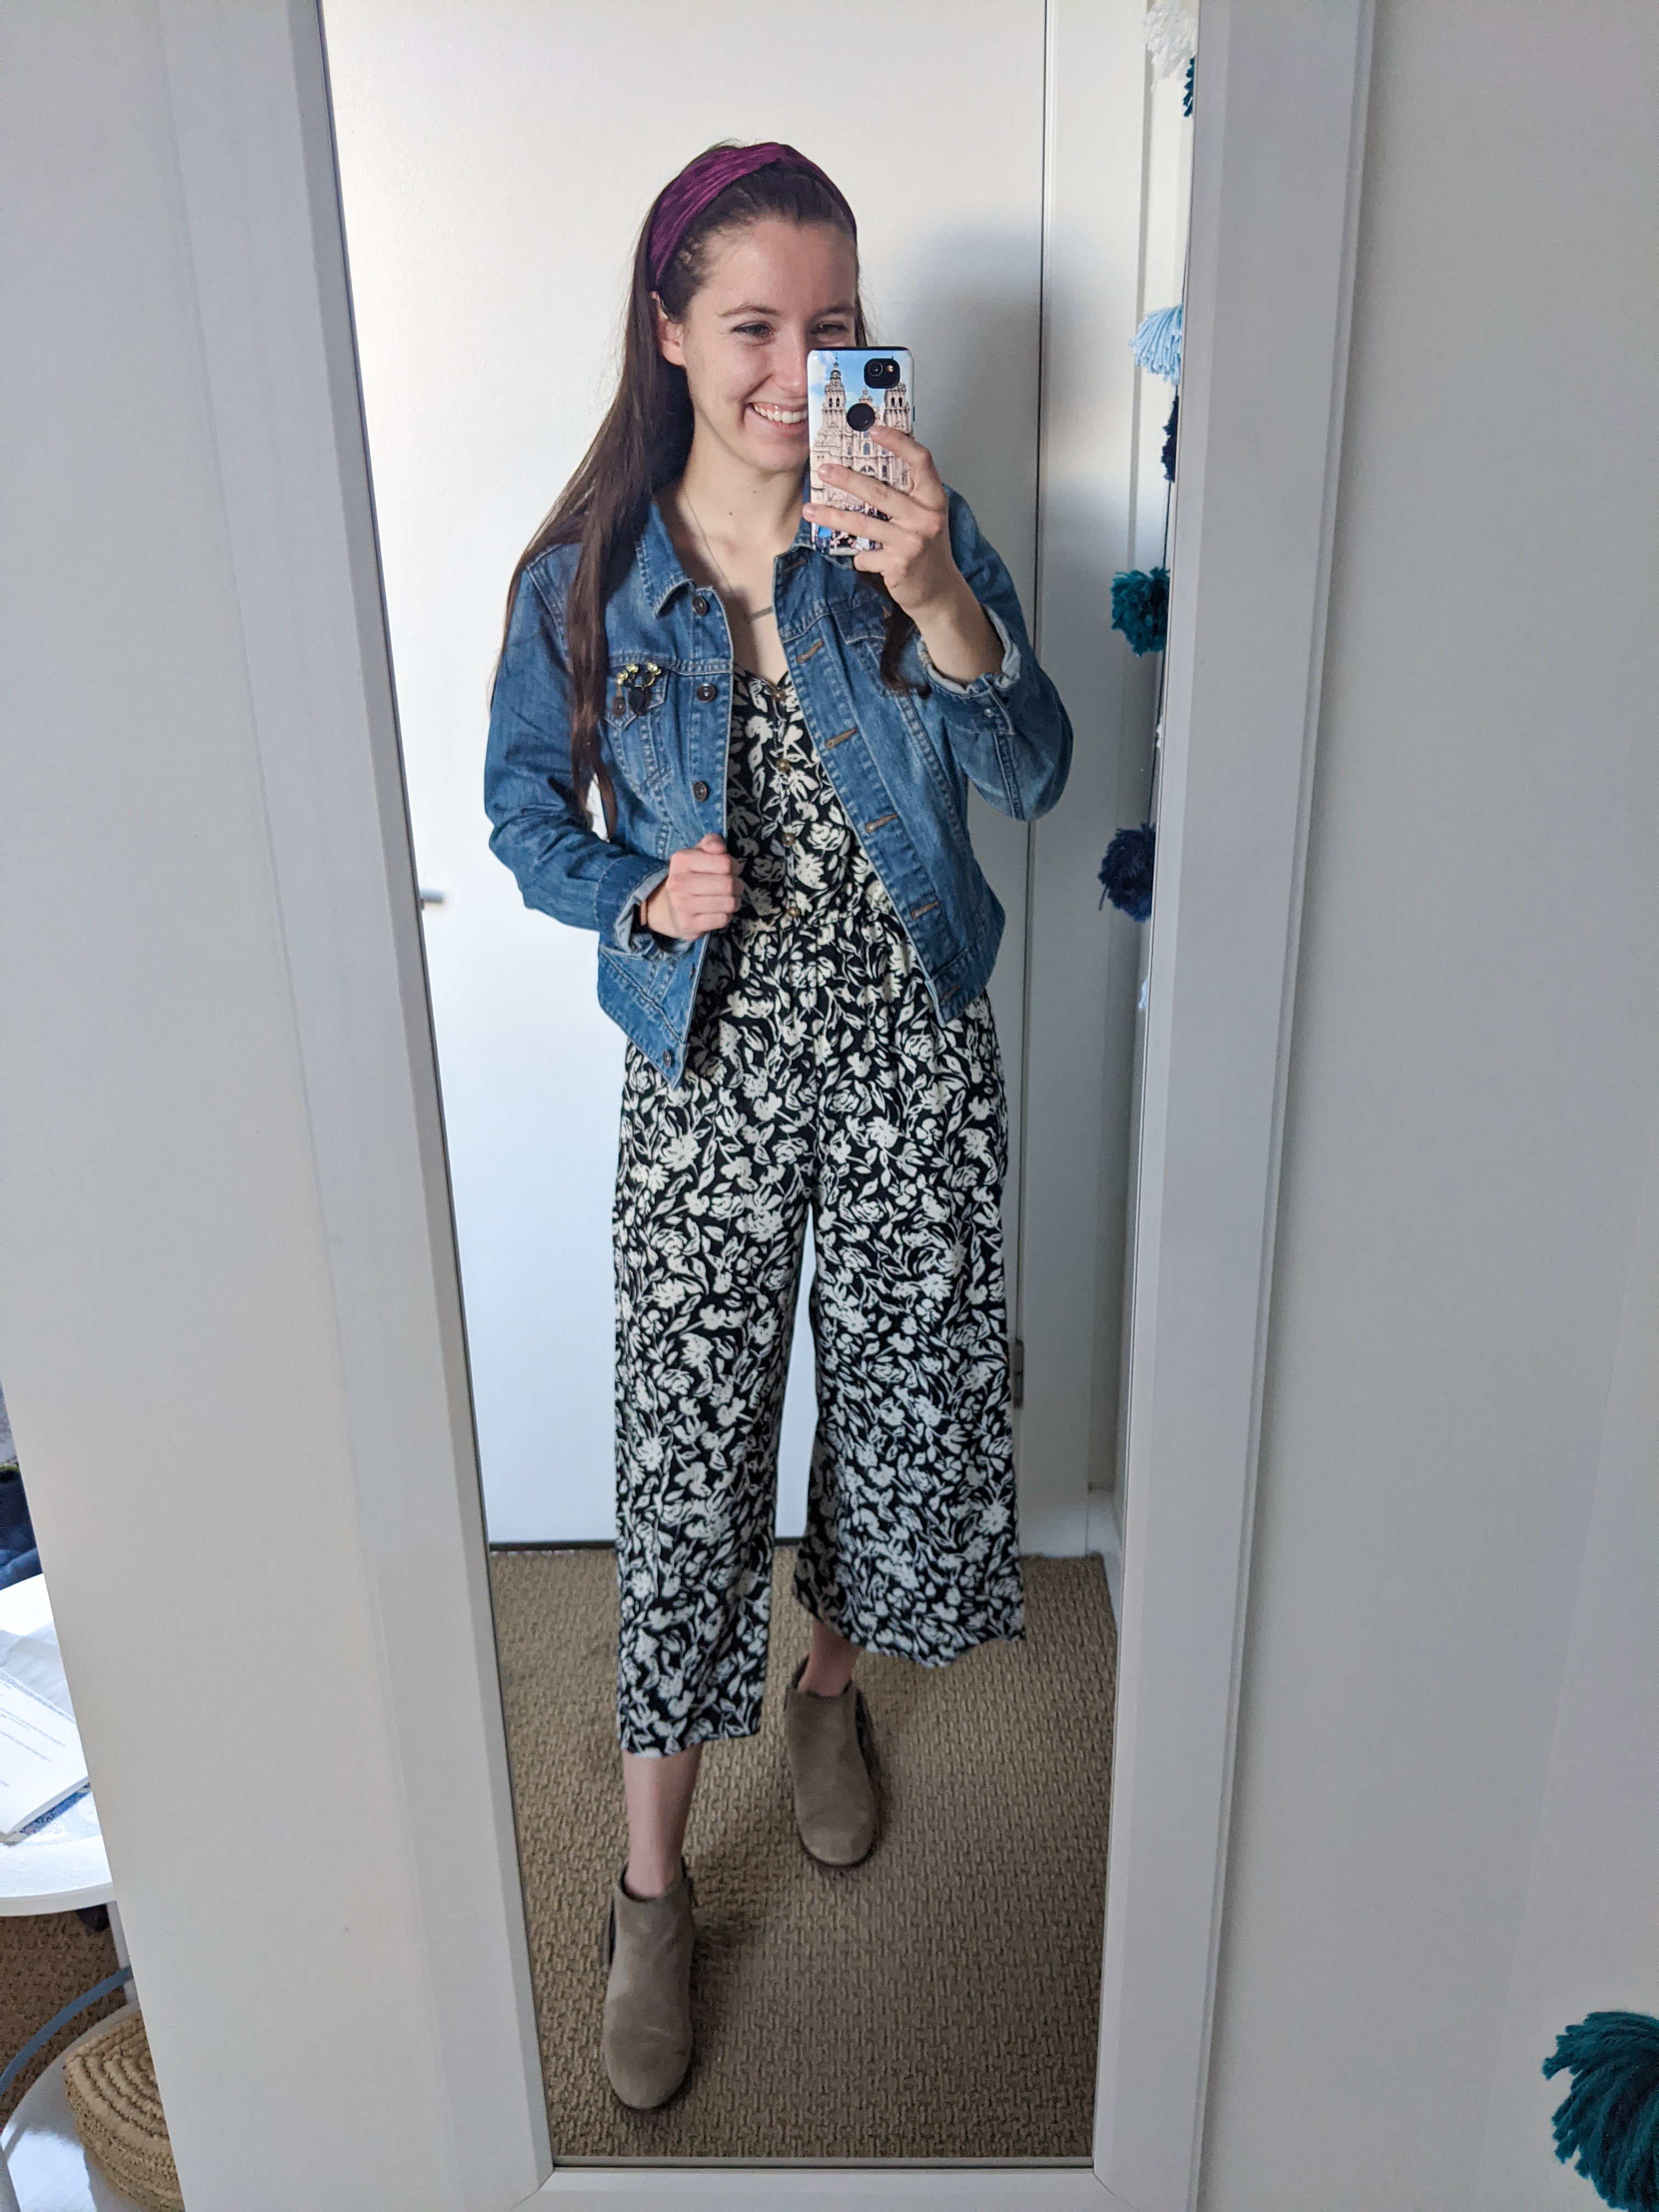 floral-jumpsuit-jean-jacket-beige-booties-fall-style